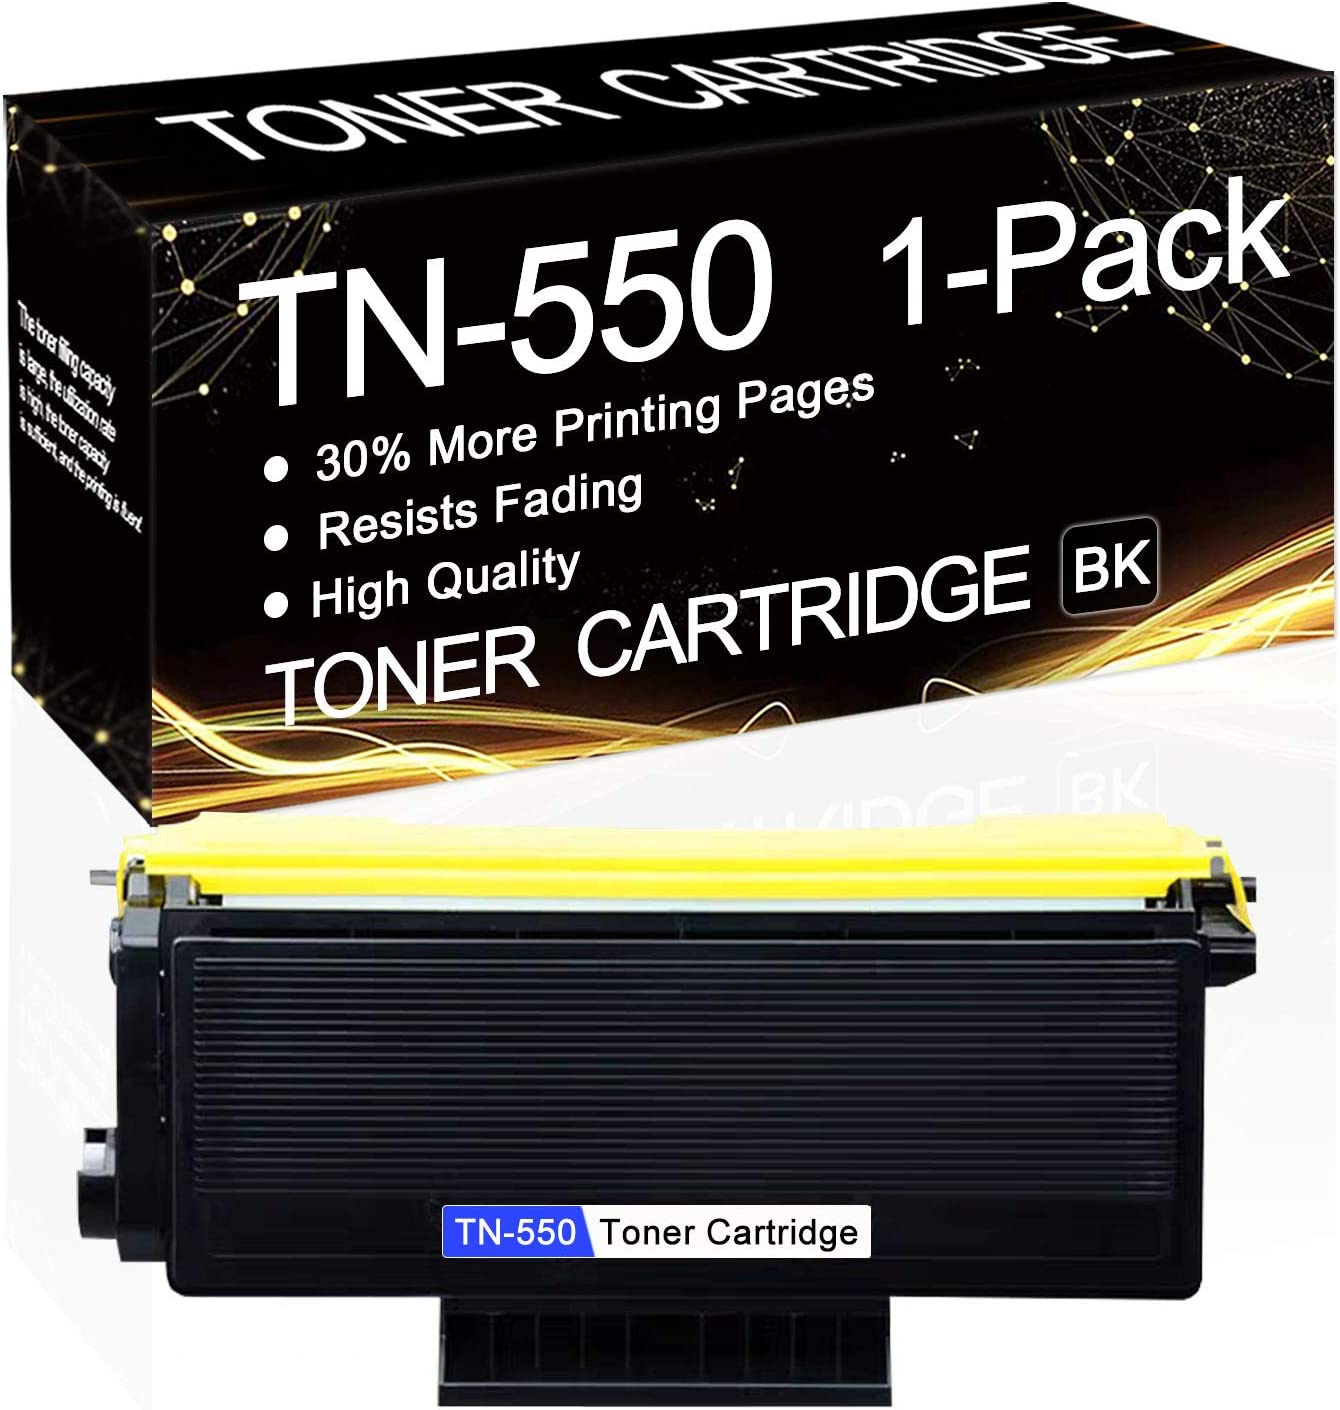 1 Pack 営業 TN-550 Black 高級な TN550 Compatible Replacement Toner Cartridge